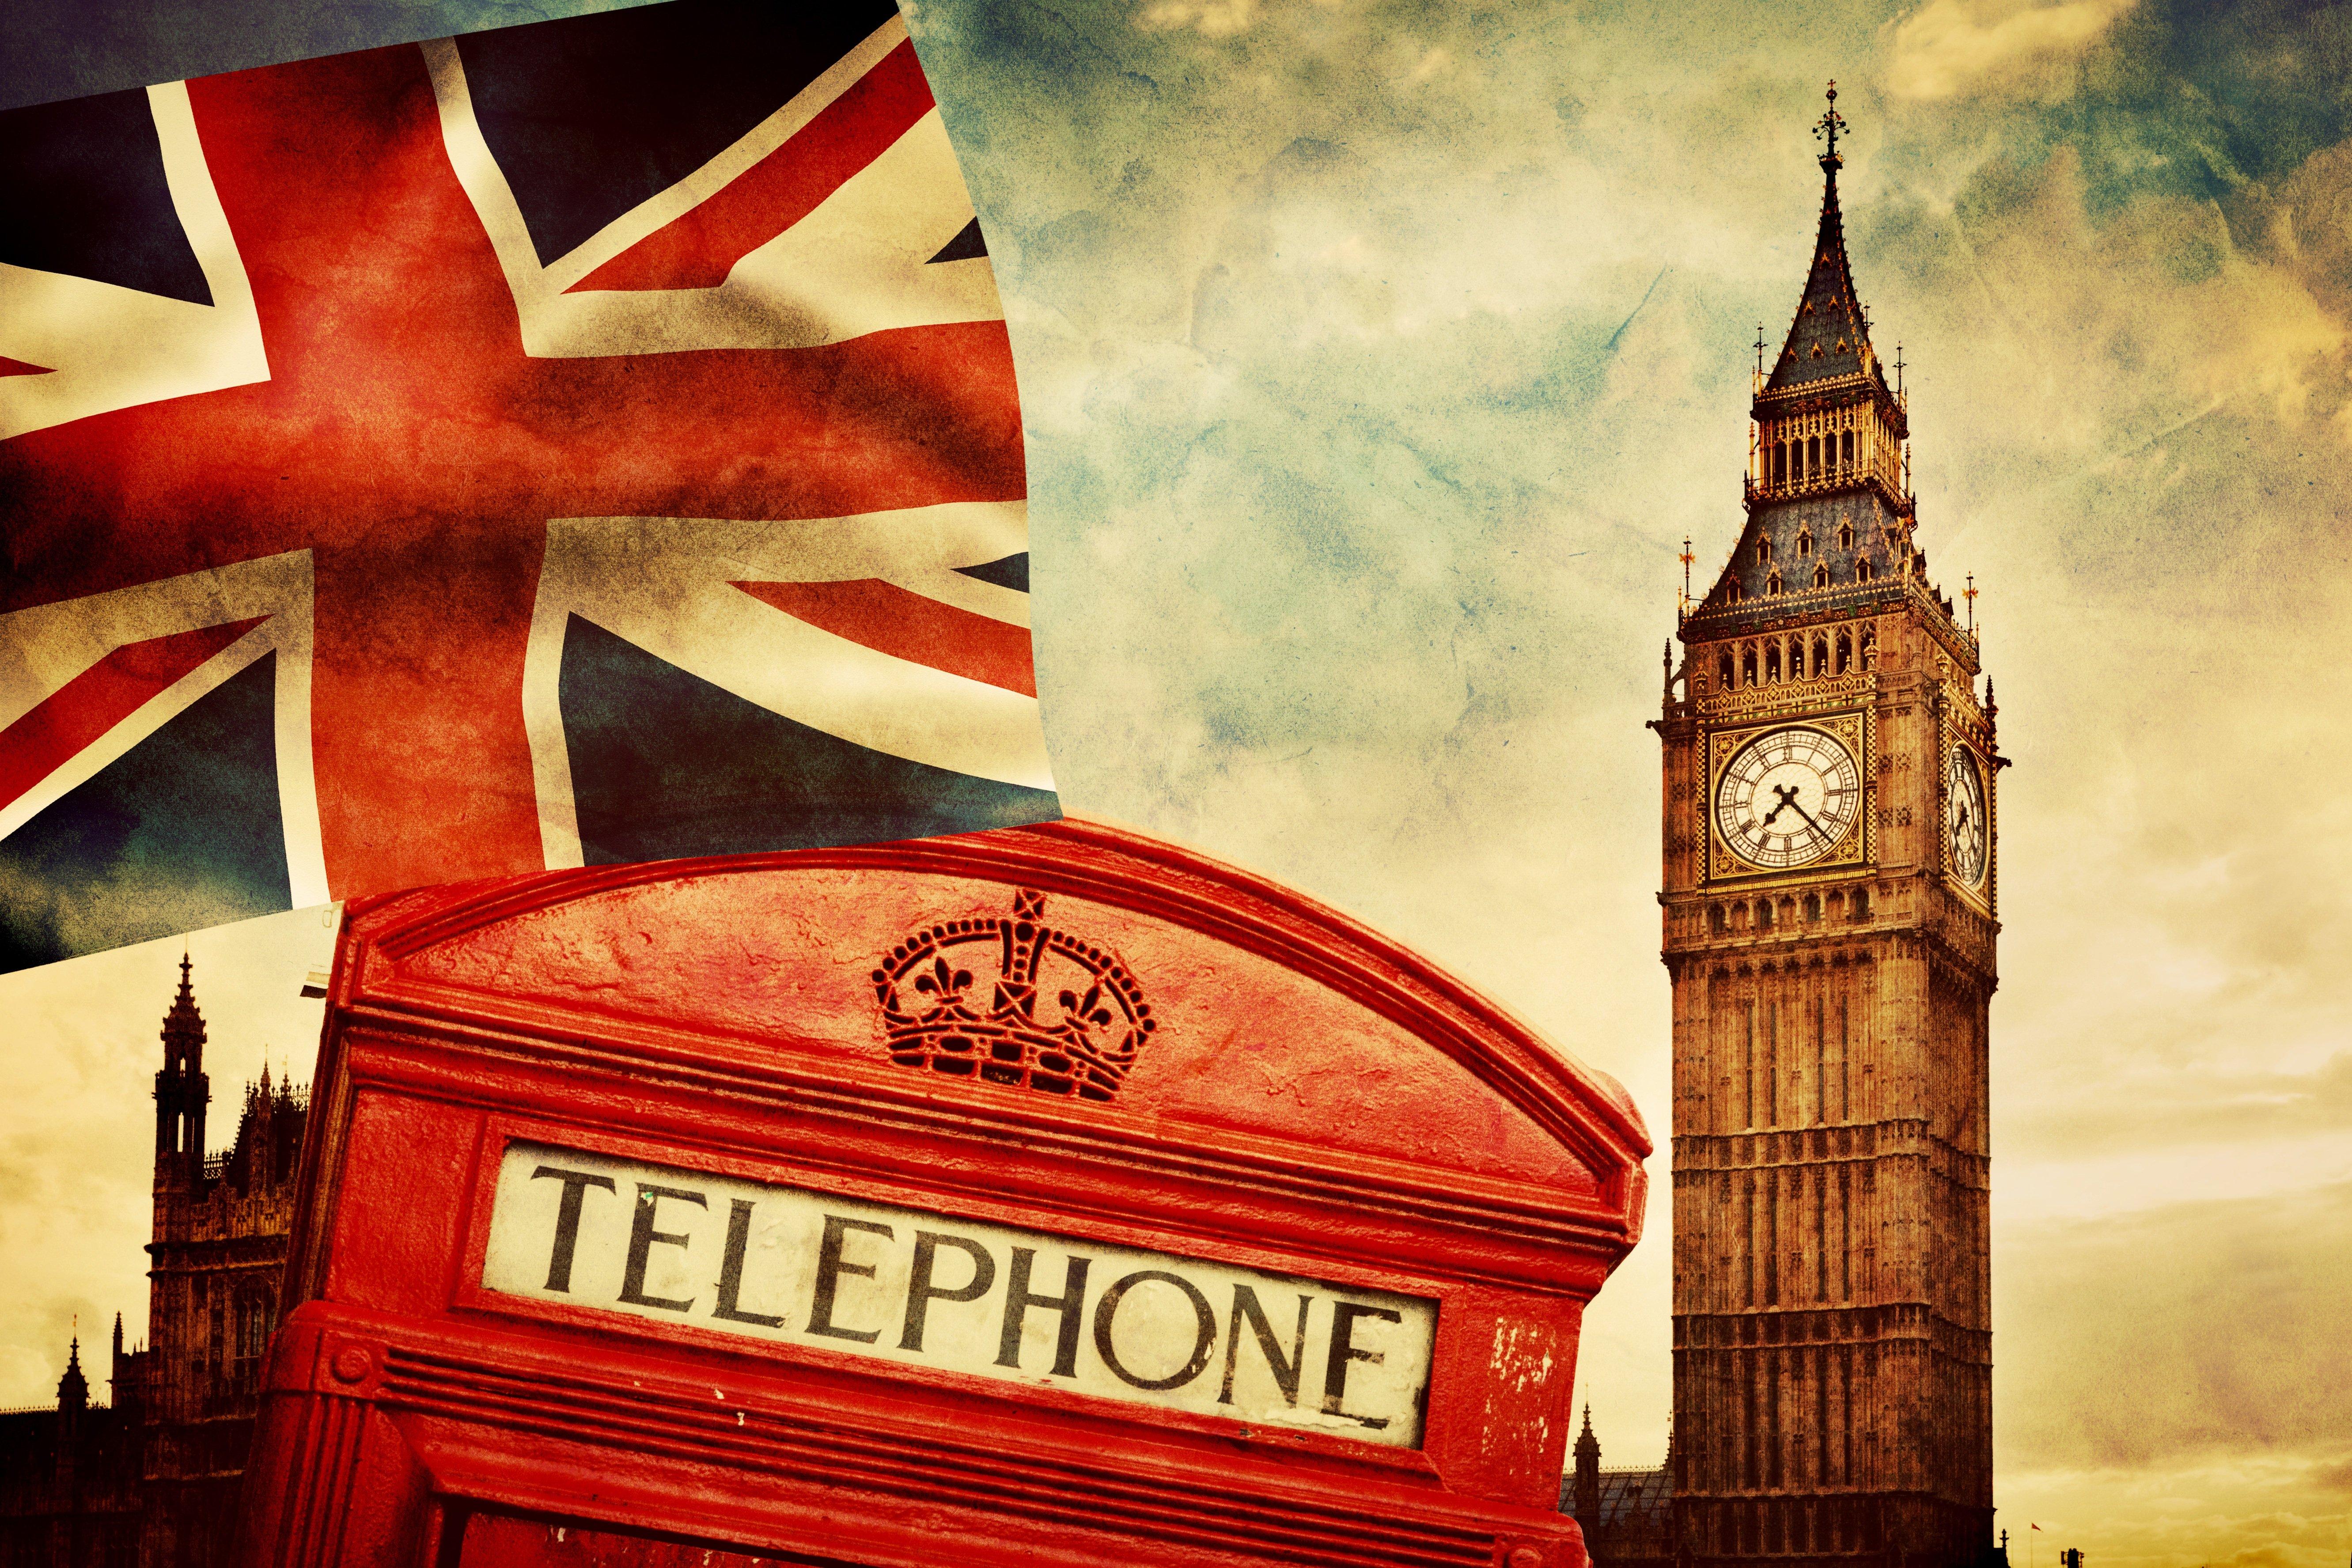 London, telephone, vintage, british flag, Big Ben :: Wallpapers